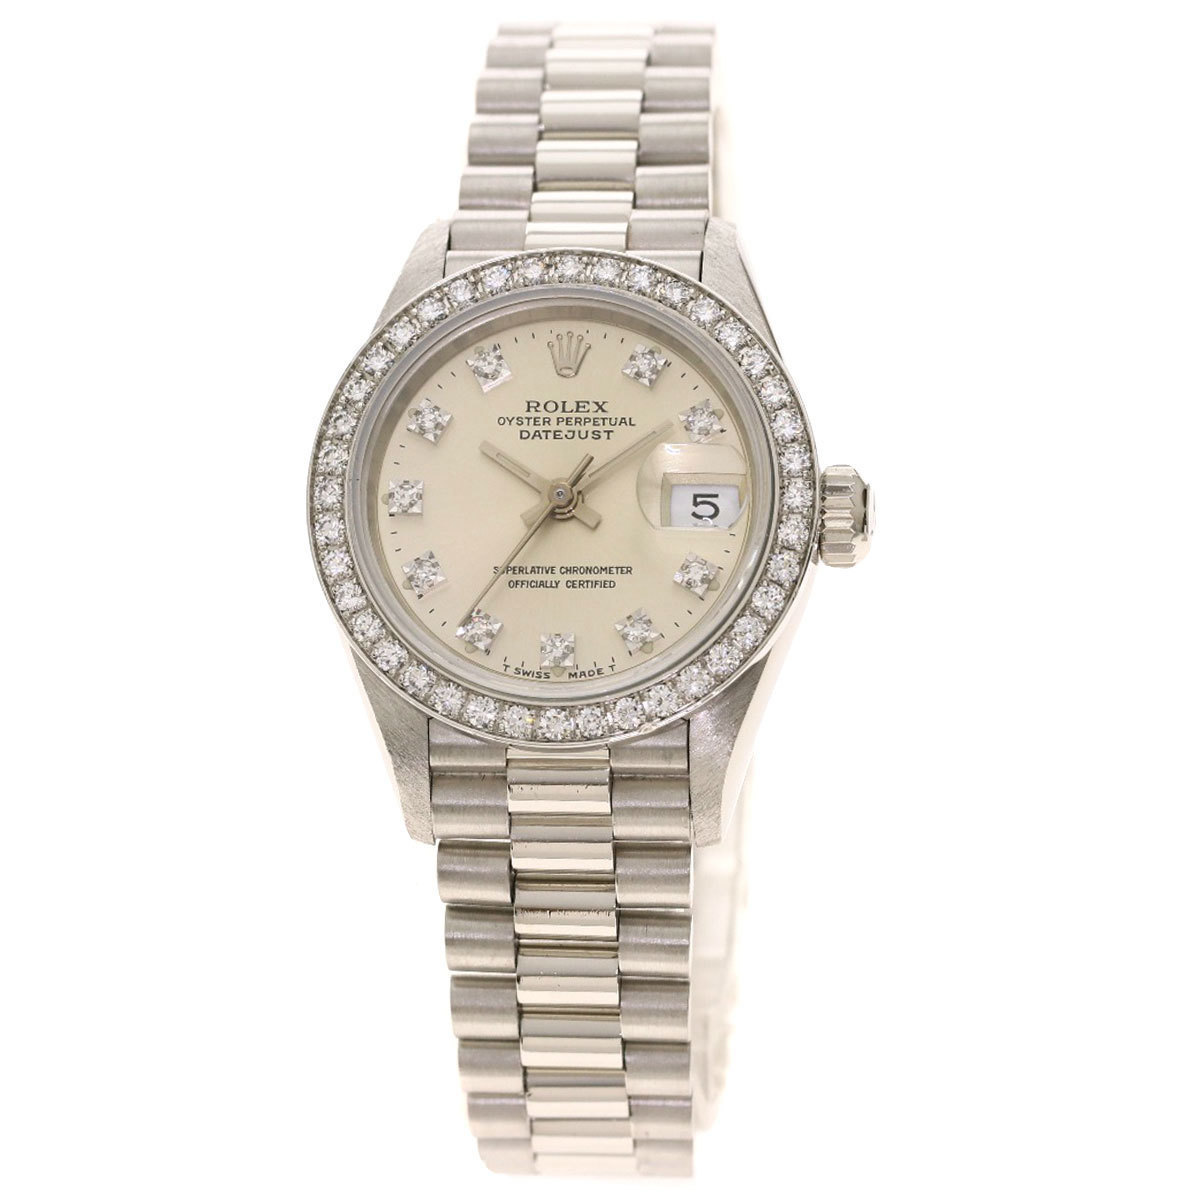 Rolex 69136G Datejust 10P Diamond Watch Platinum PT Ladies